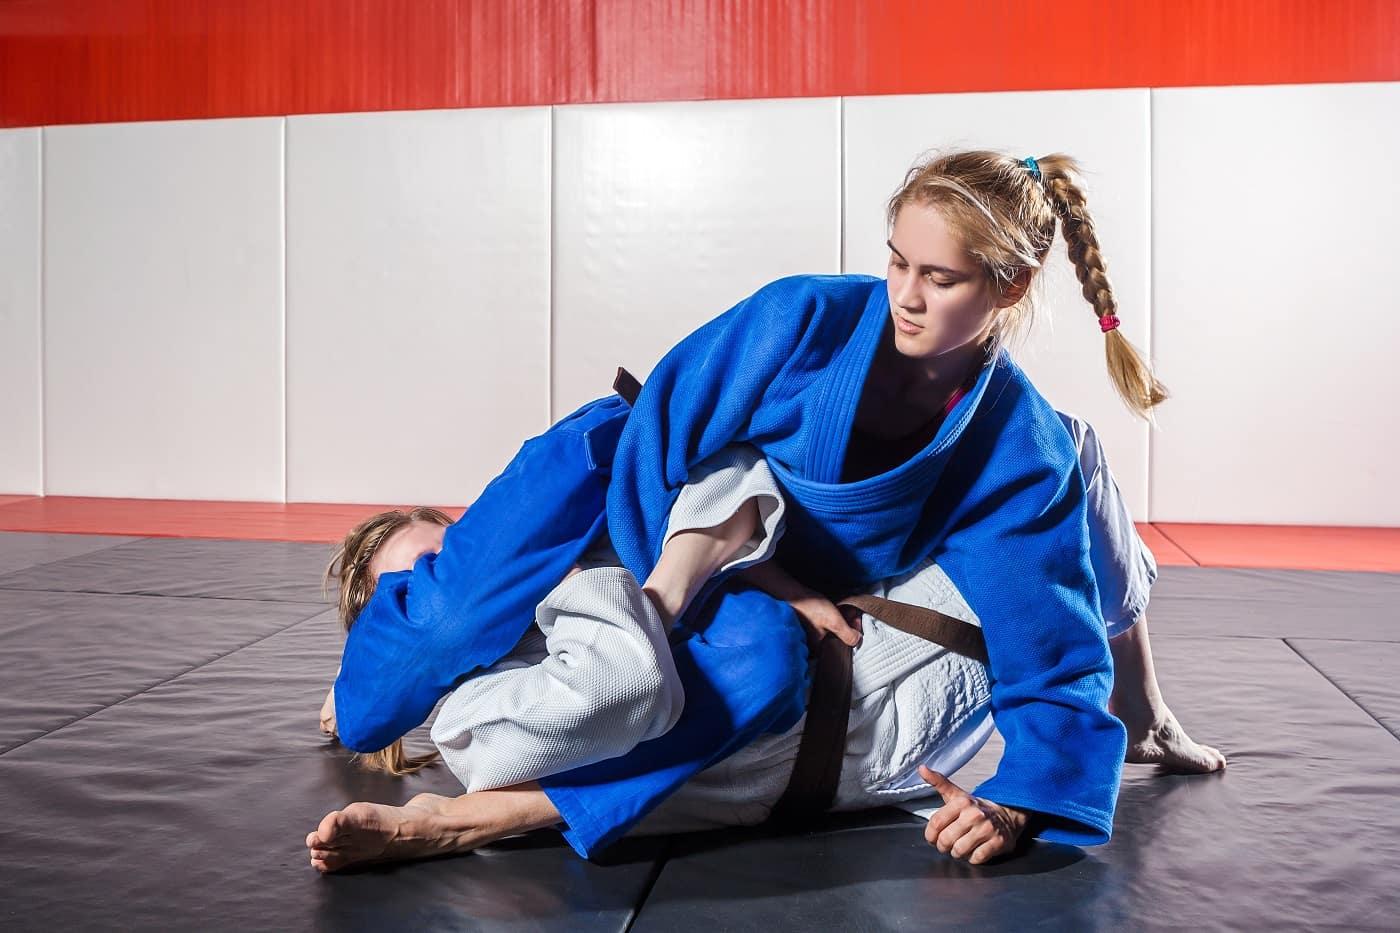 Beginner Jiu-Jitsu